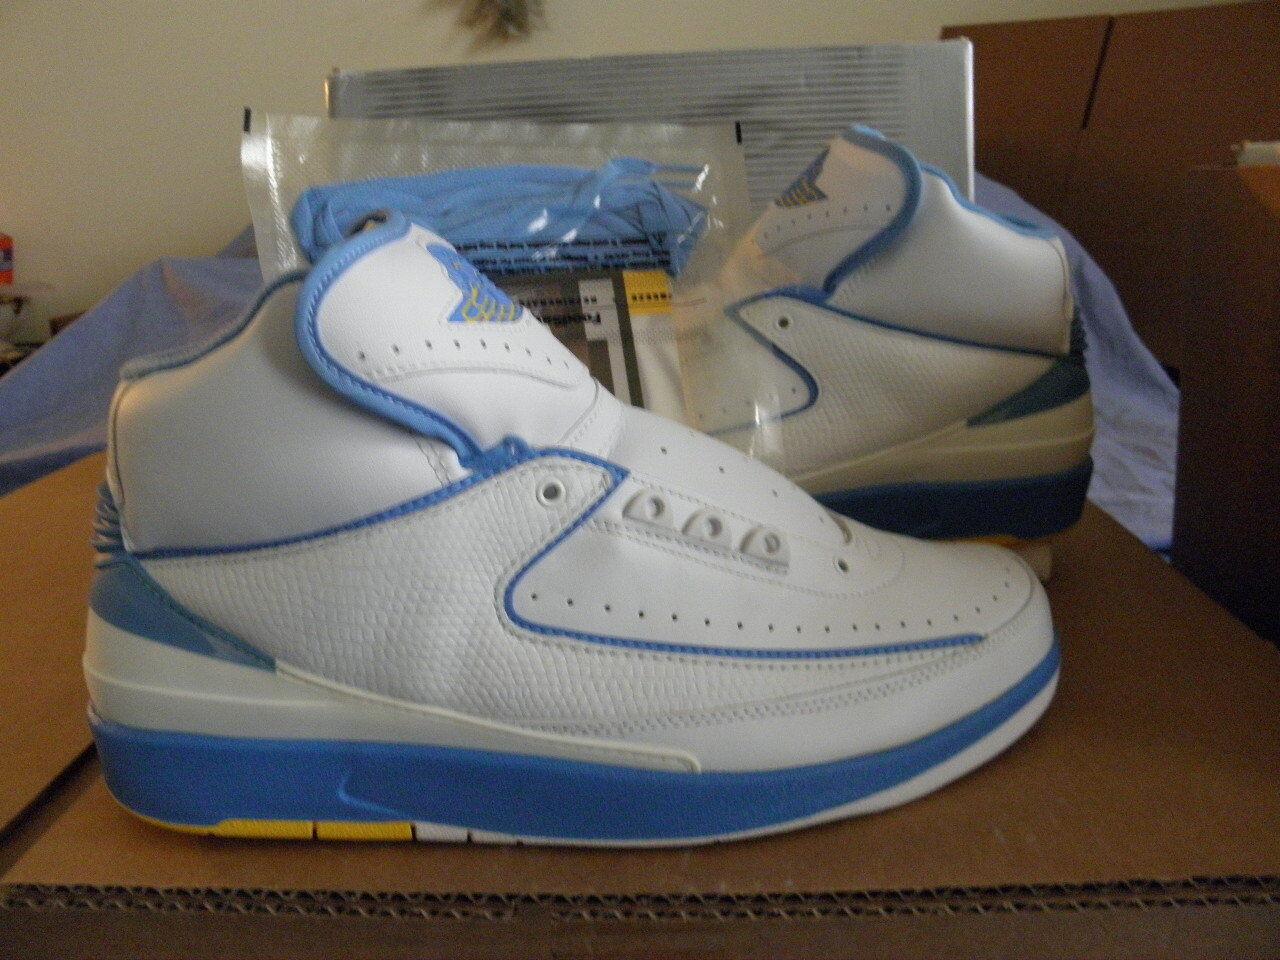 Nike Air Jordan II MELO 2 Two Retro OG 2004 NIB DS NEW RARE Doernbecher sz 10.5